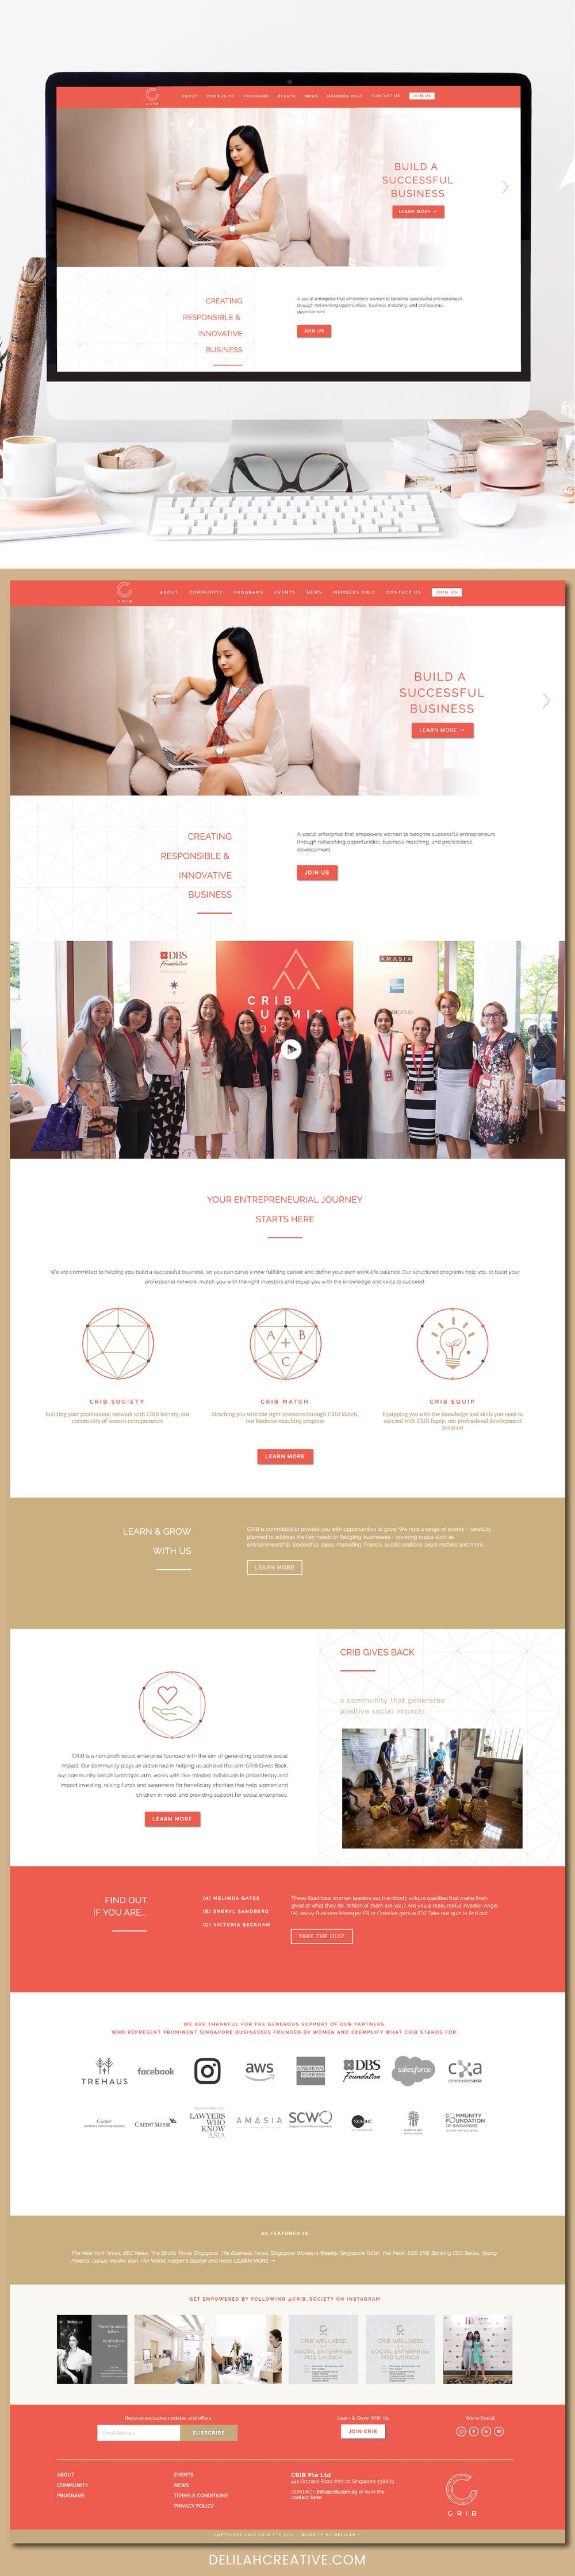 PortfolioCrib Website.png